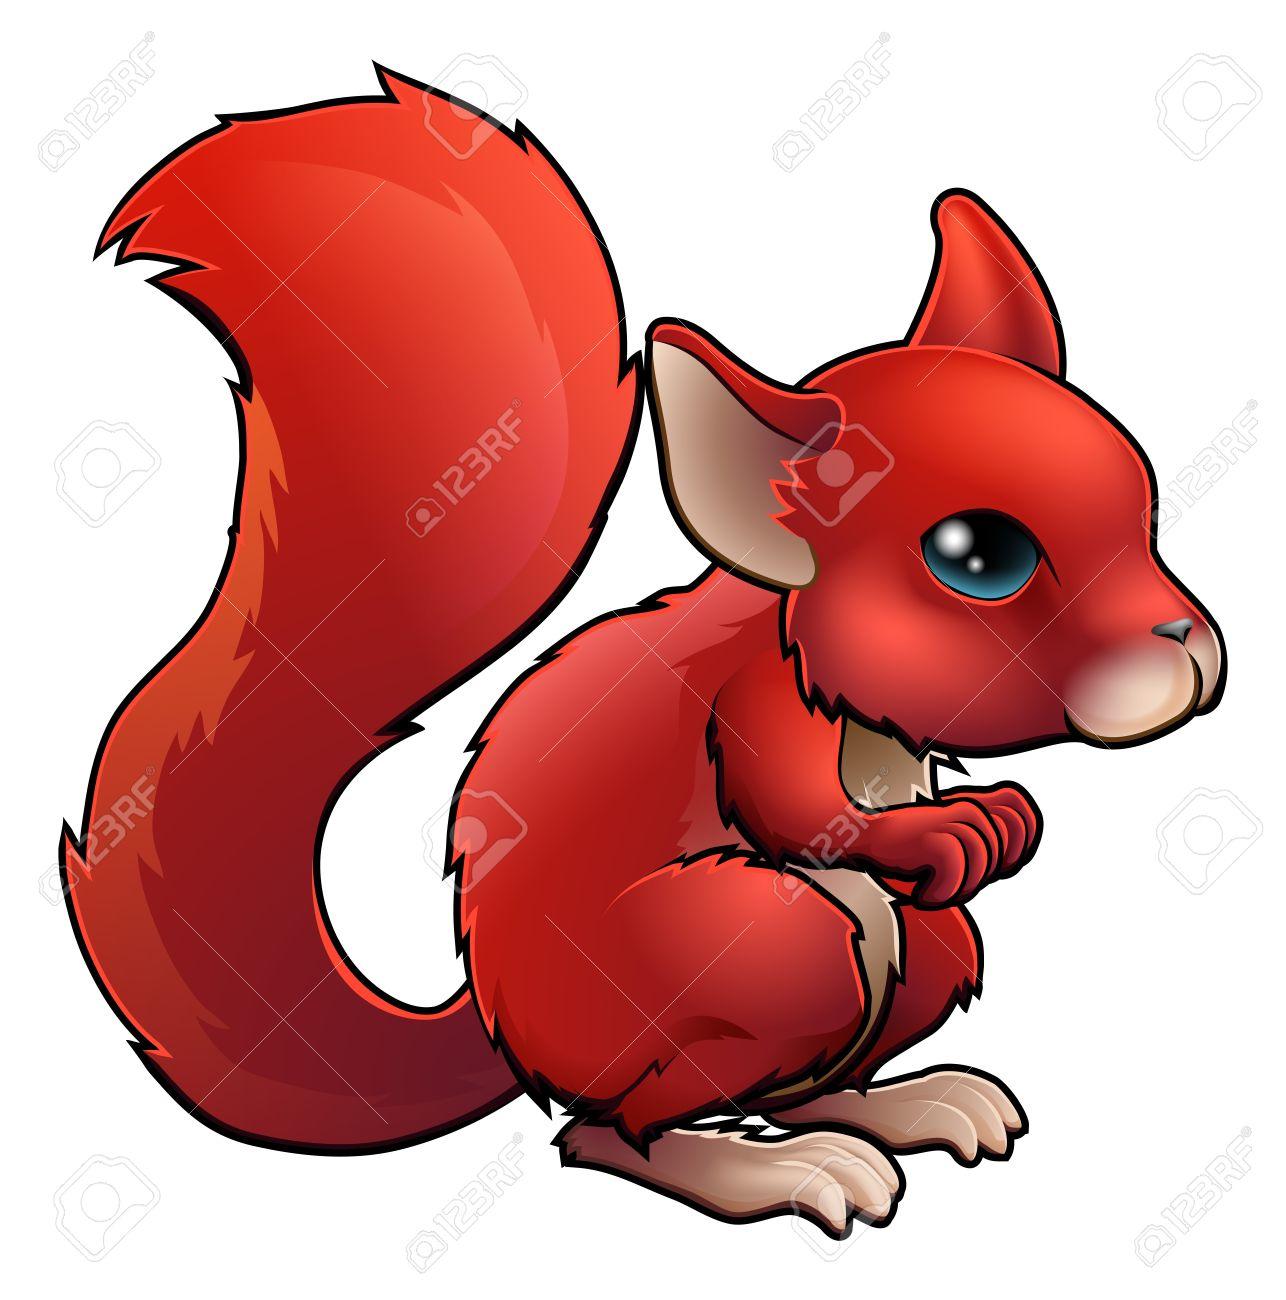 1286x1300 Red Squirrel Clipart Cartoon